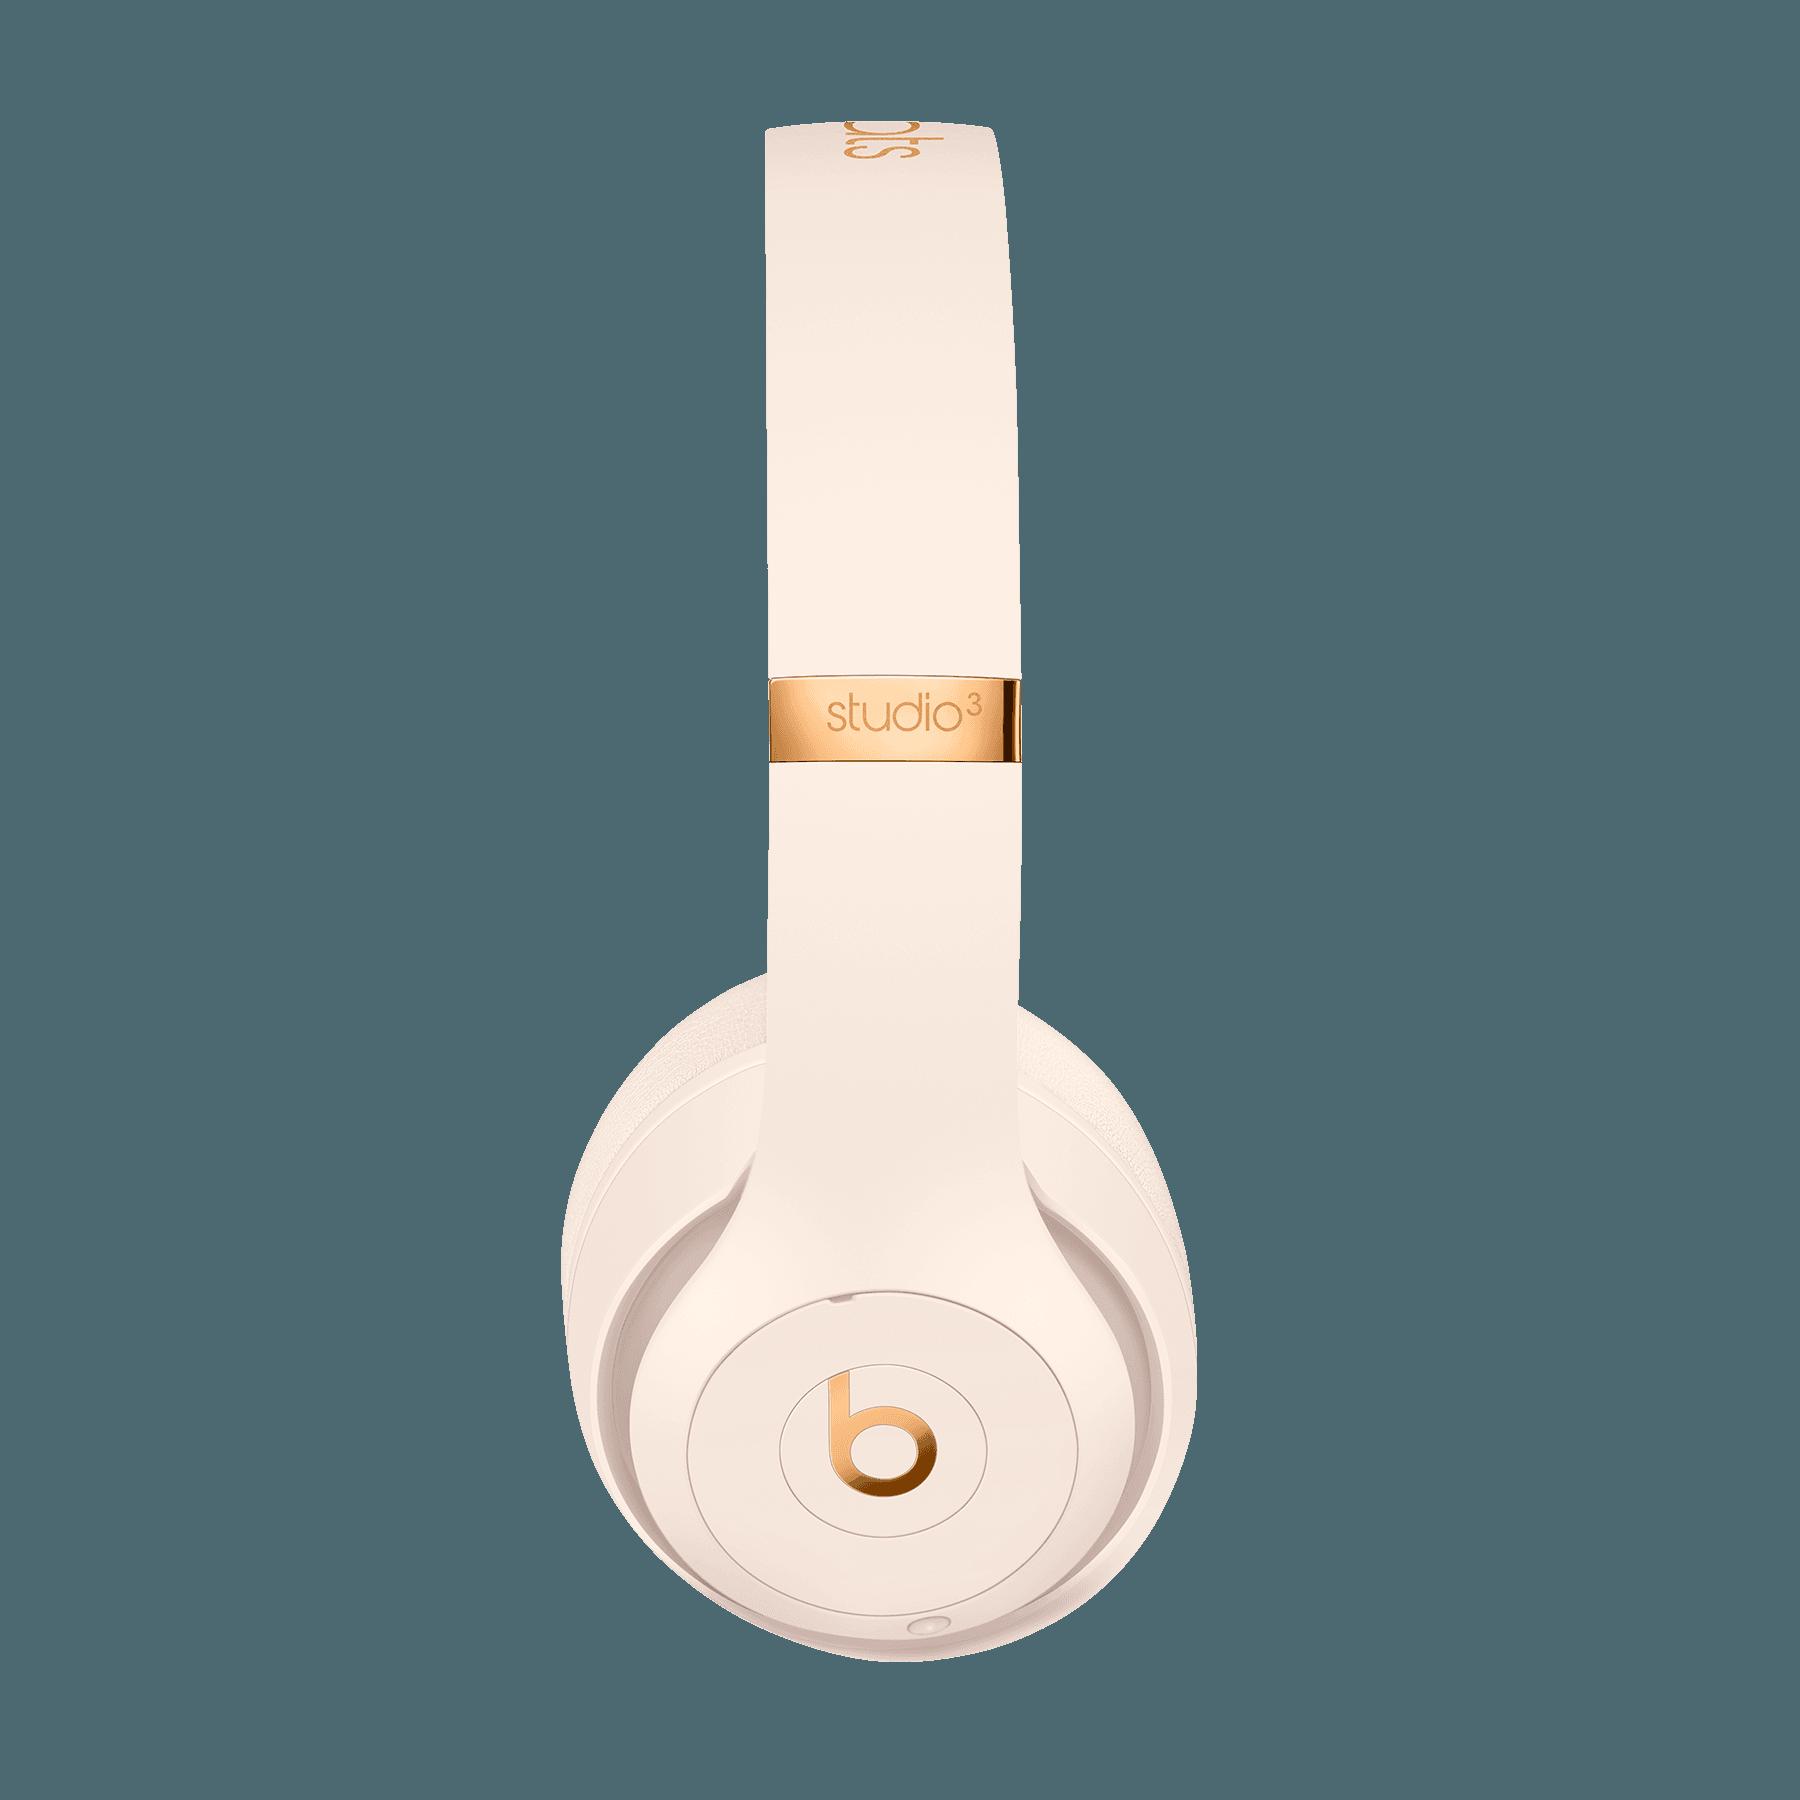 ff95bb4691d Beats Studio3 Wireless headphones – Beats by Dre